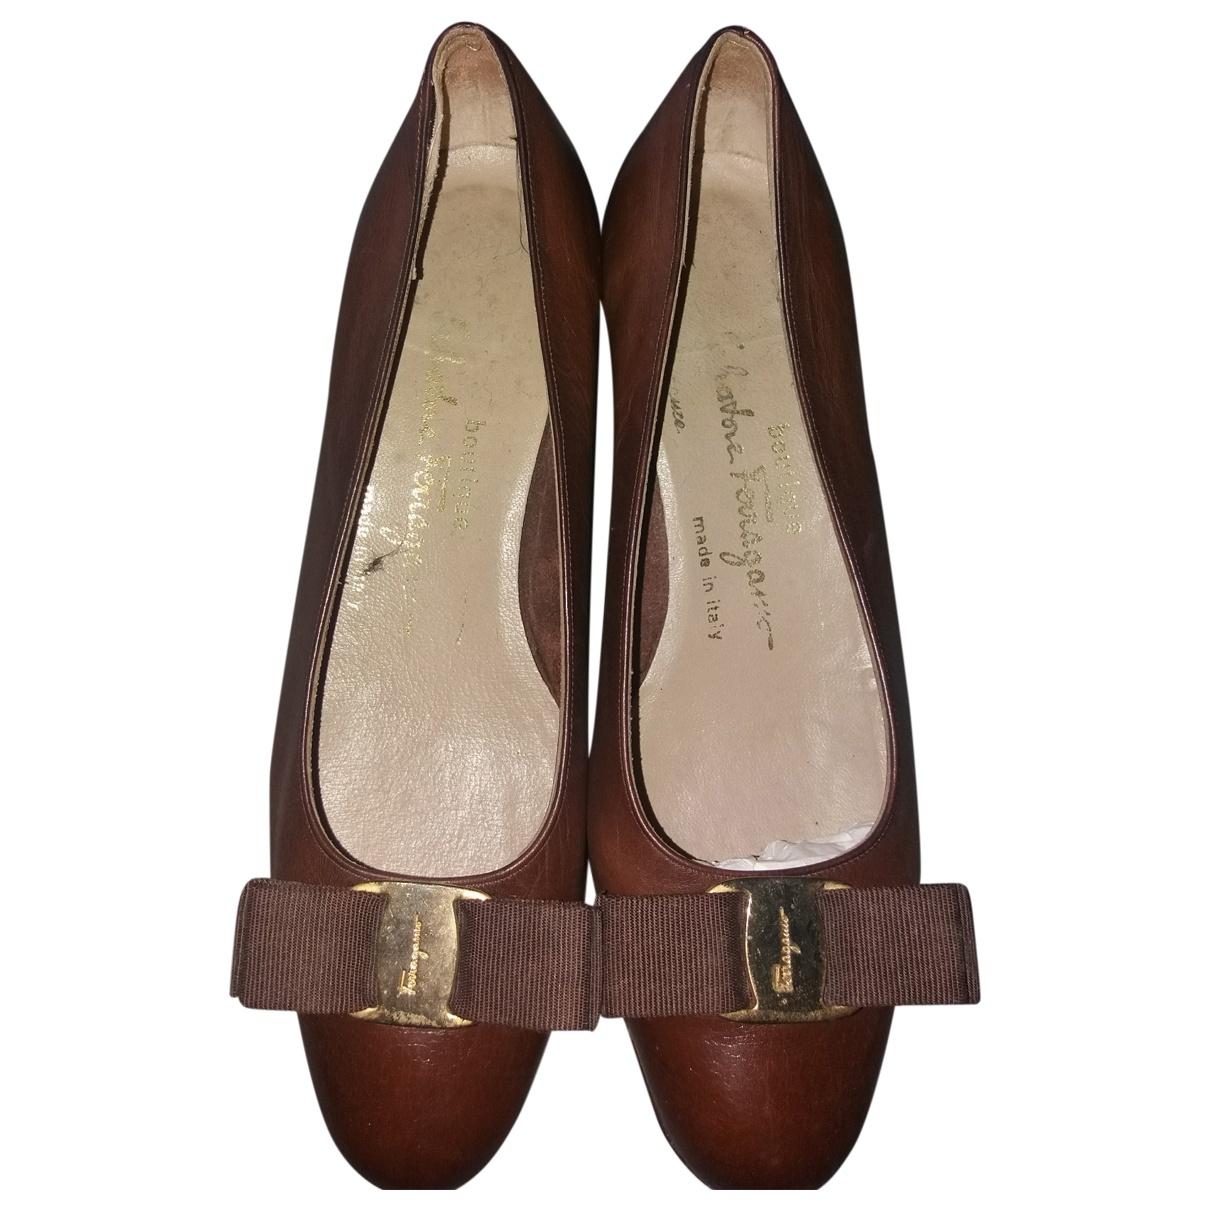 Salvatore Ferragamo \N Brown Leather Flats for Women 36.5 EU